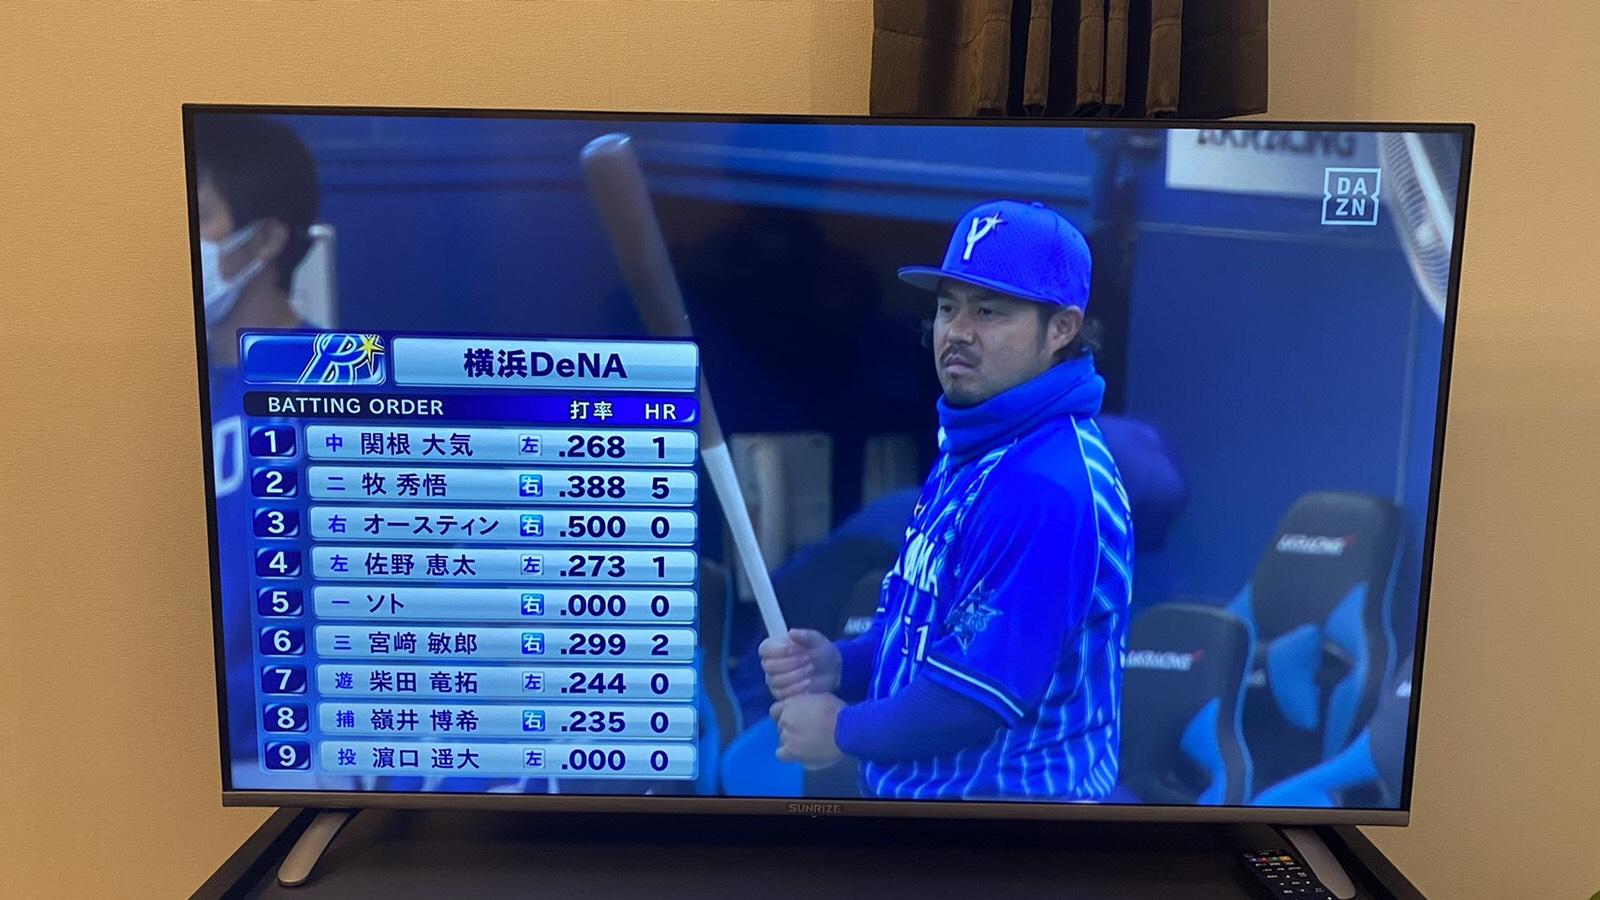 TVで毎試合楽しめるプロ野球DAZN・試合開始前から放送ばっちり!